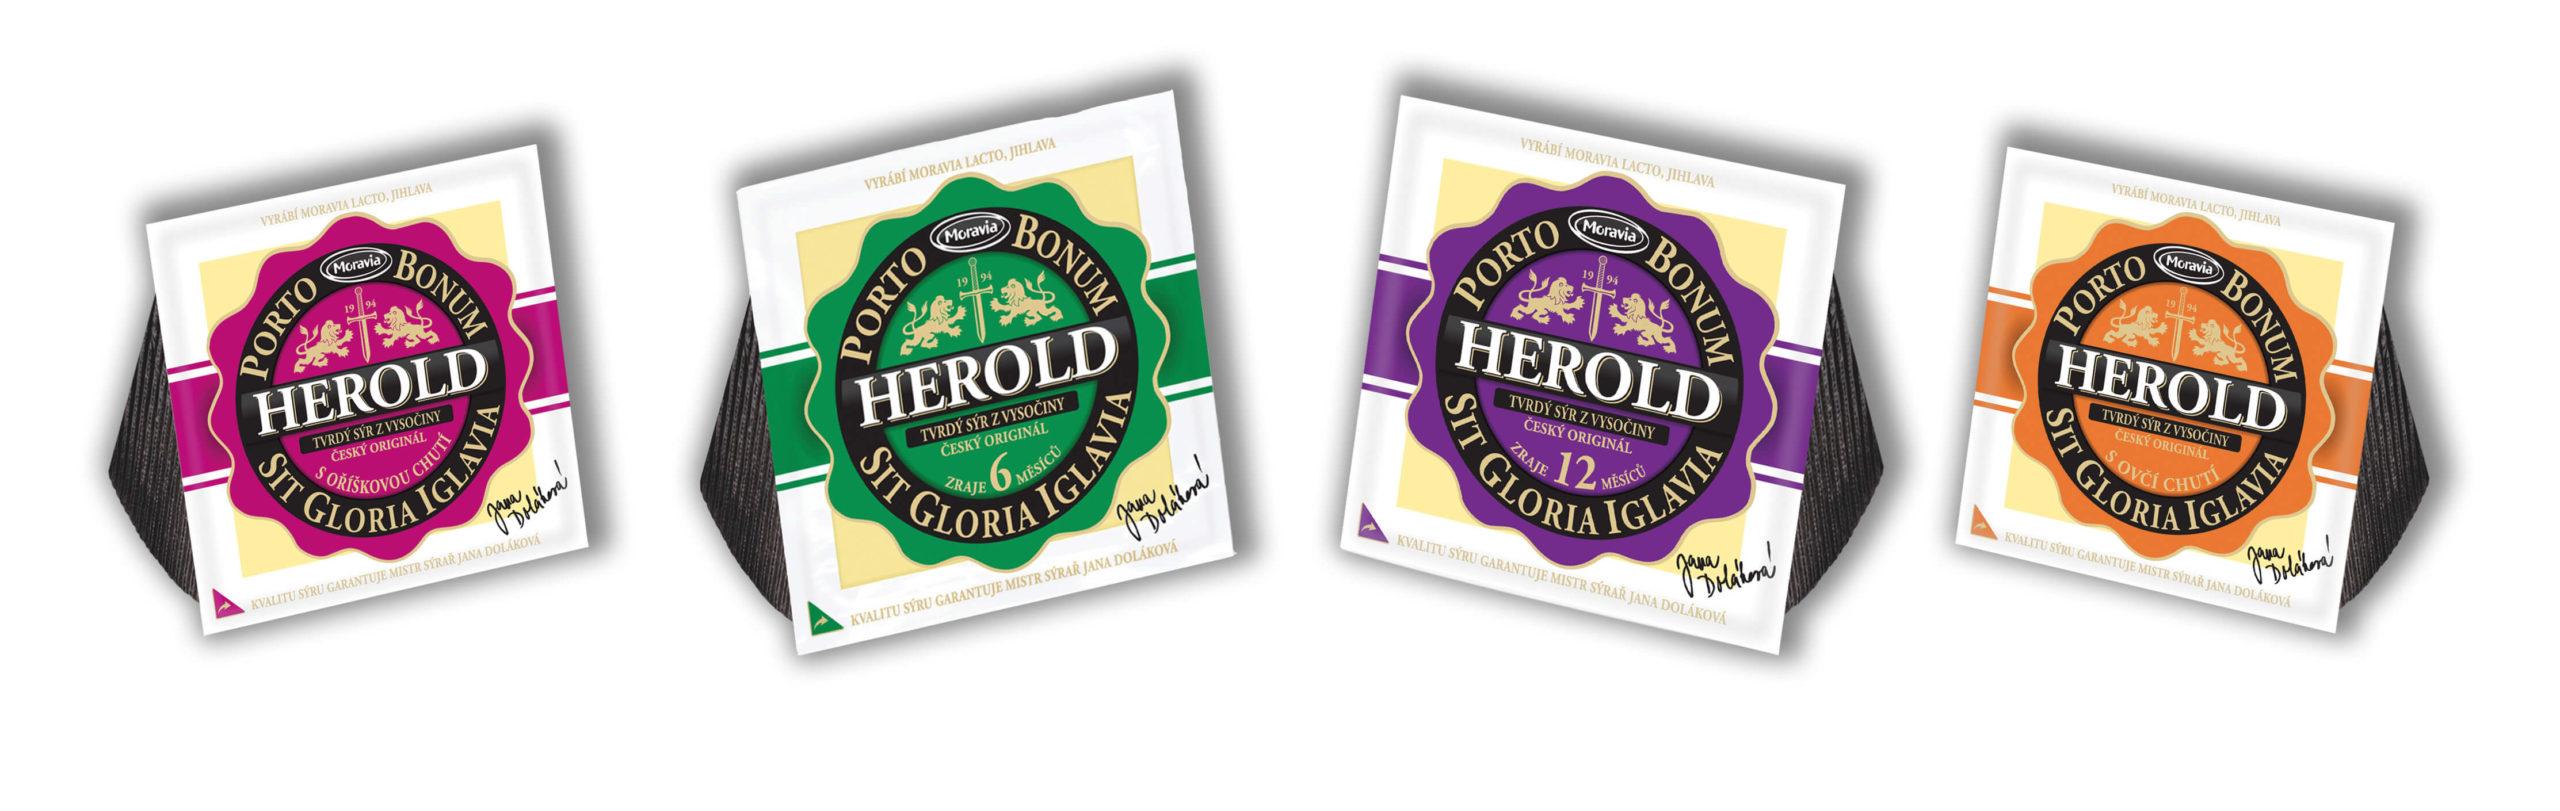 4 druhy sýru Herold